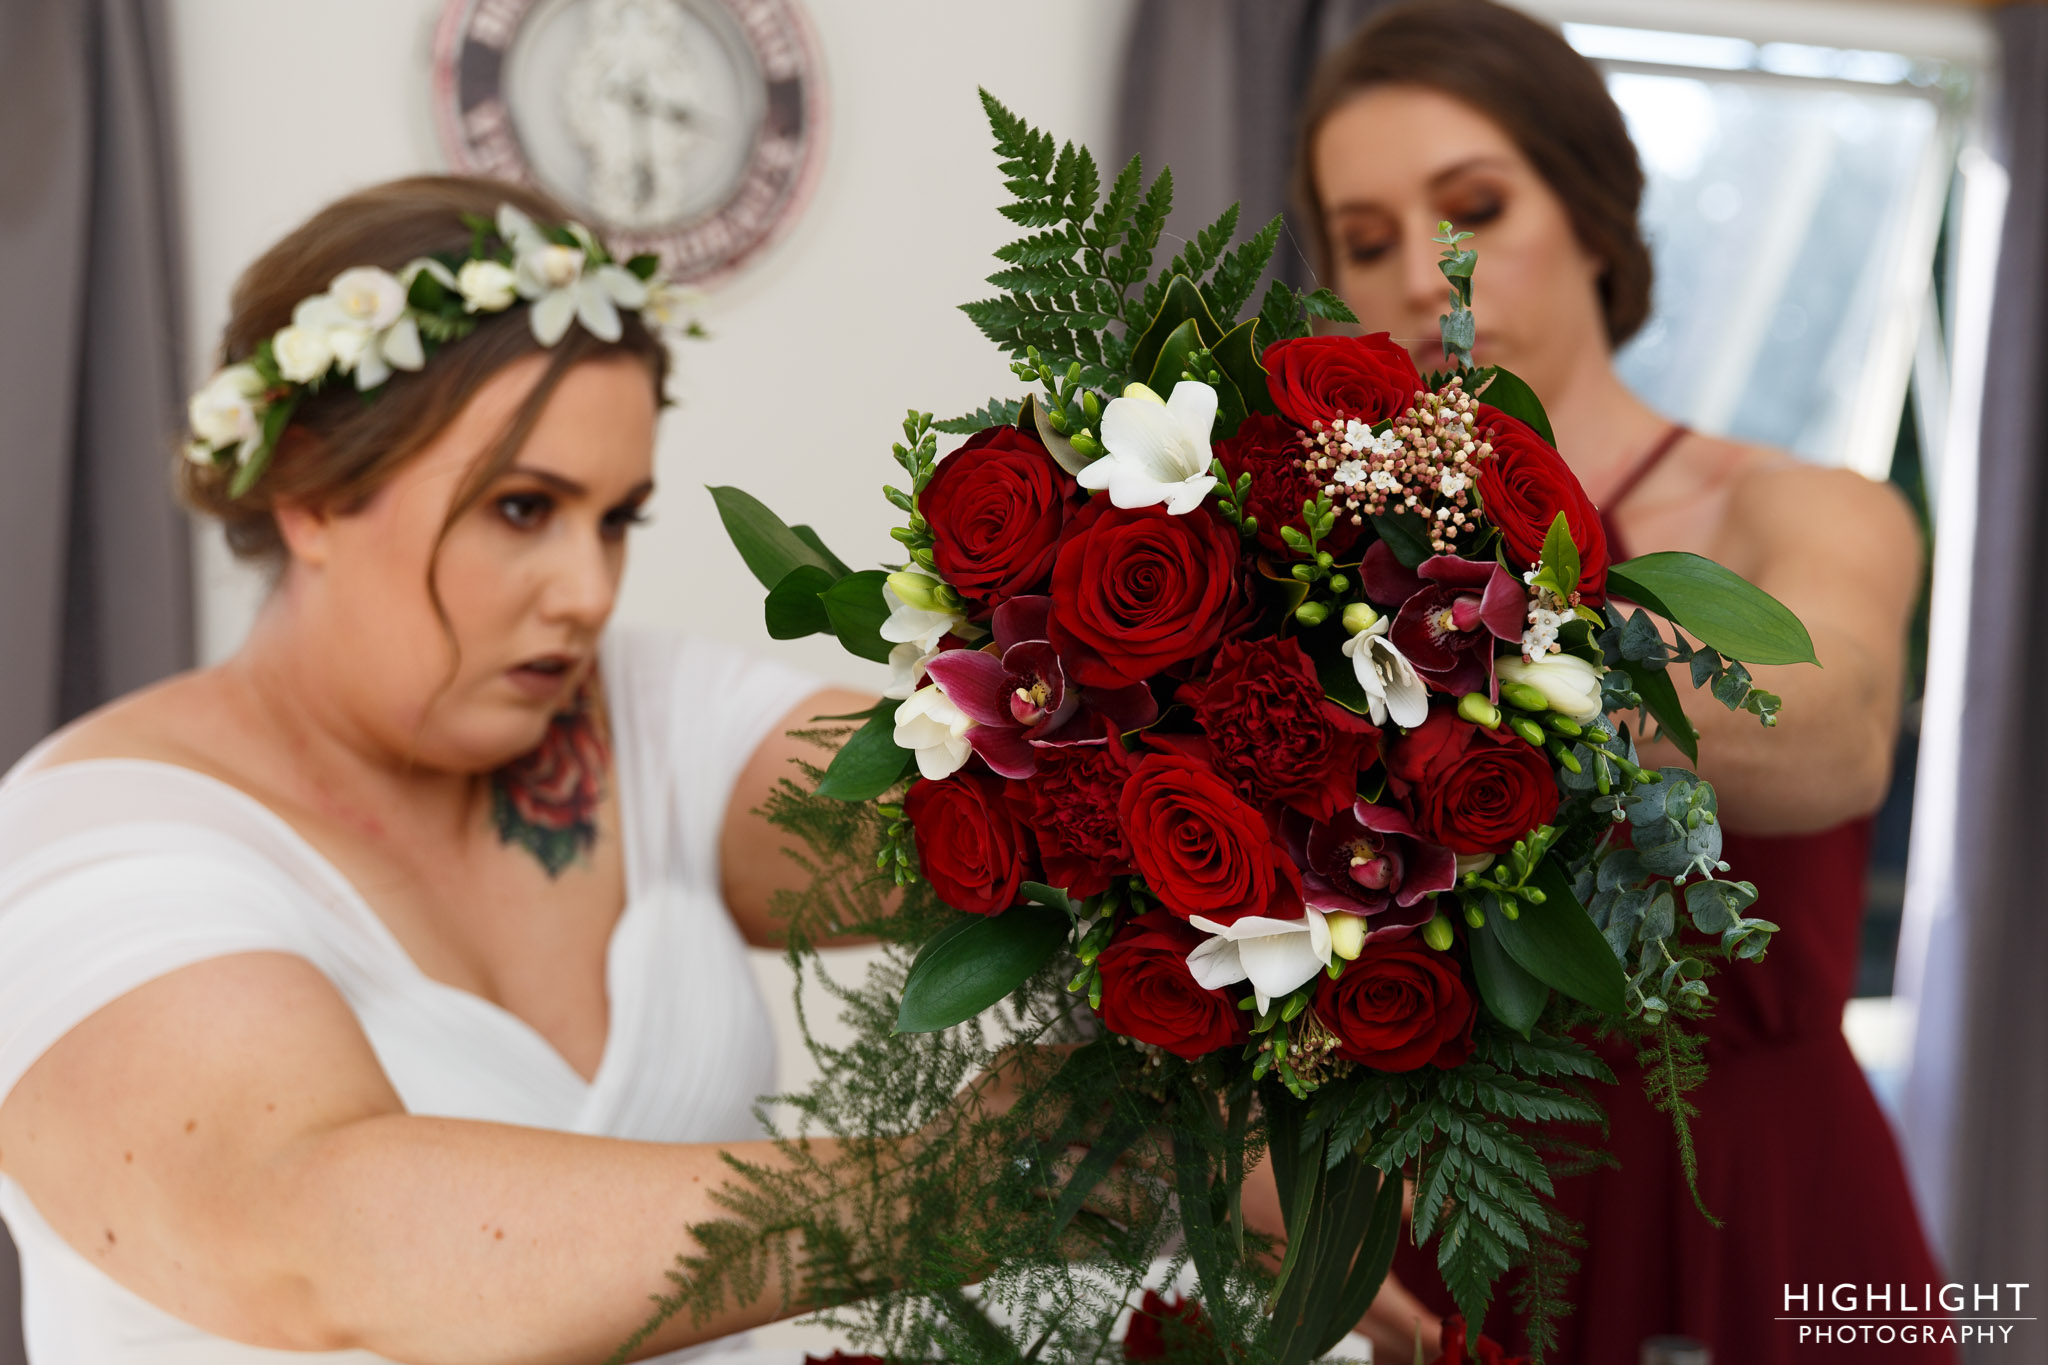 Highlight-wedding-photography-new-zealand-palmerston-north-15.jpg